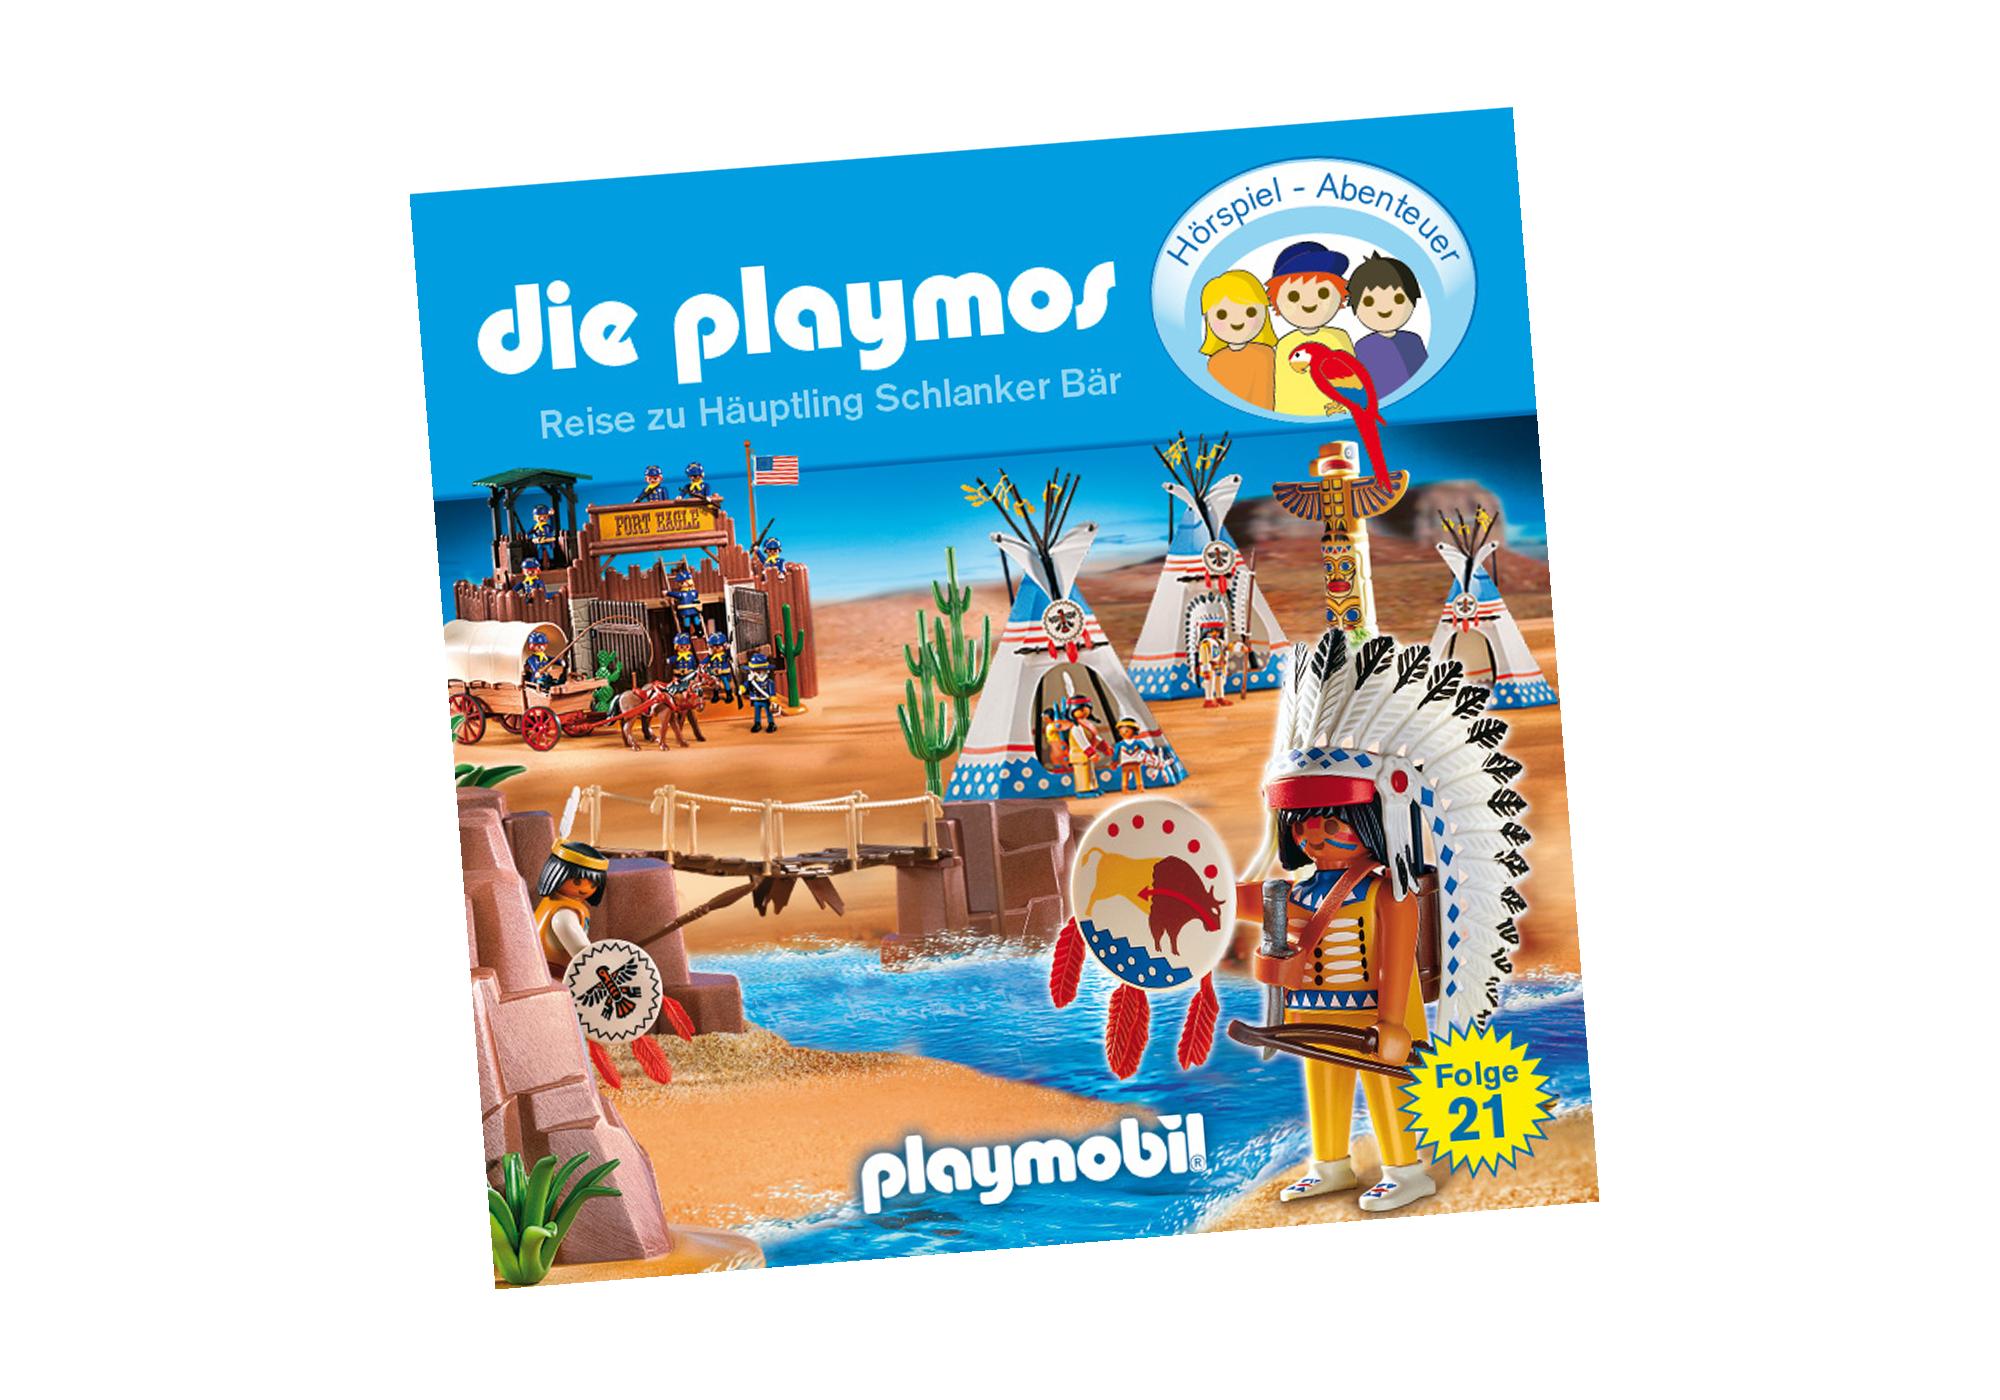 http://media.playmobil.com/i/playmobil/80322_product_detail/Reise zu Häuptling schlanker Bär (21) - CD